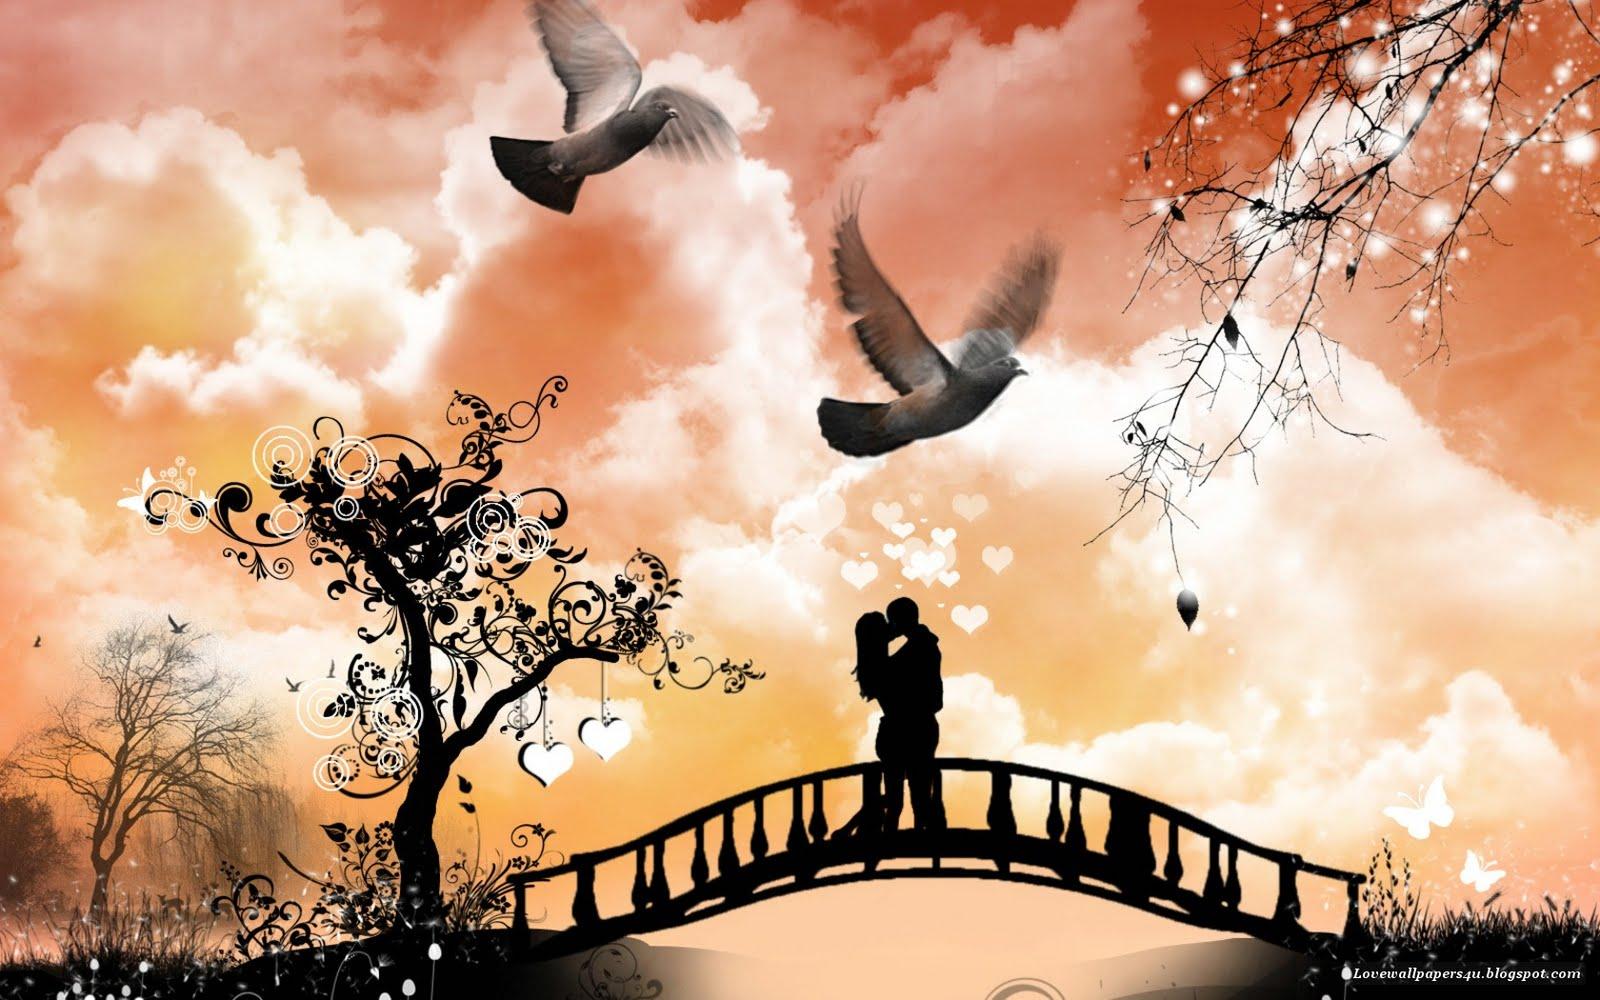 Love wallpaper hdLove wallpaperromantic wallpapers hdromantic 1600x1000